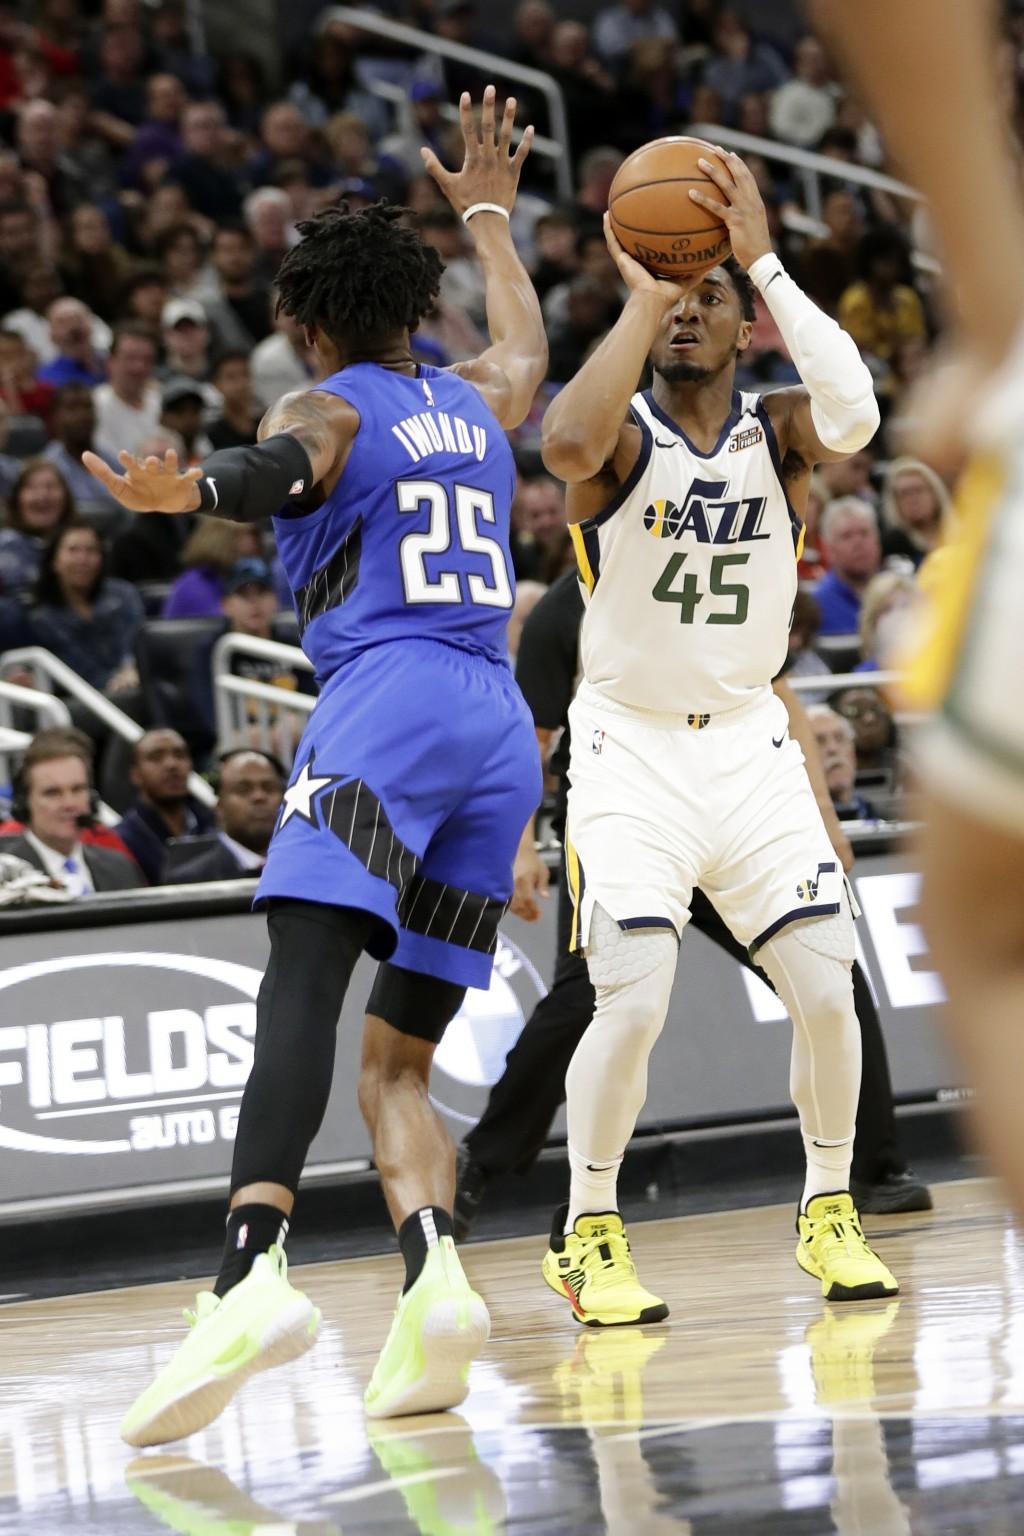 Utah Jazz guard Donovan Mitchell (45) takes a shot over Orlando Magic forward Wes Iwundu (25) during the second half of an NBA basketball game, Saturd...